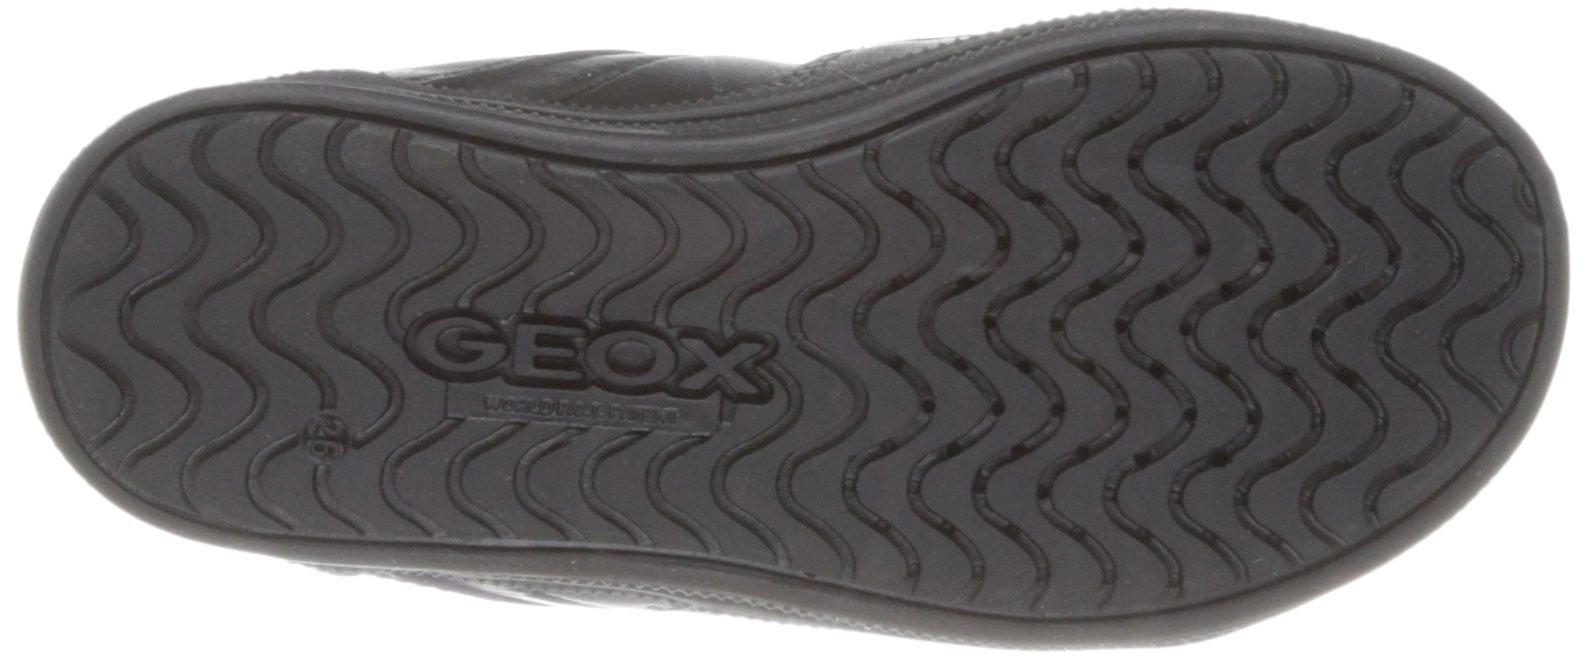 Geox JR Elvis Uniform Shoe (Toddler/Little Kid/Big Kid),Black,35 EU (3.5 M US Big Kid) by Geox (Image #3)